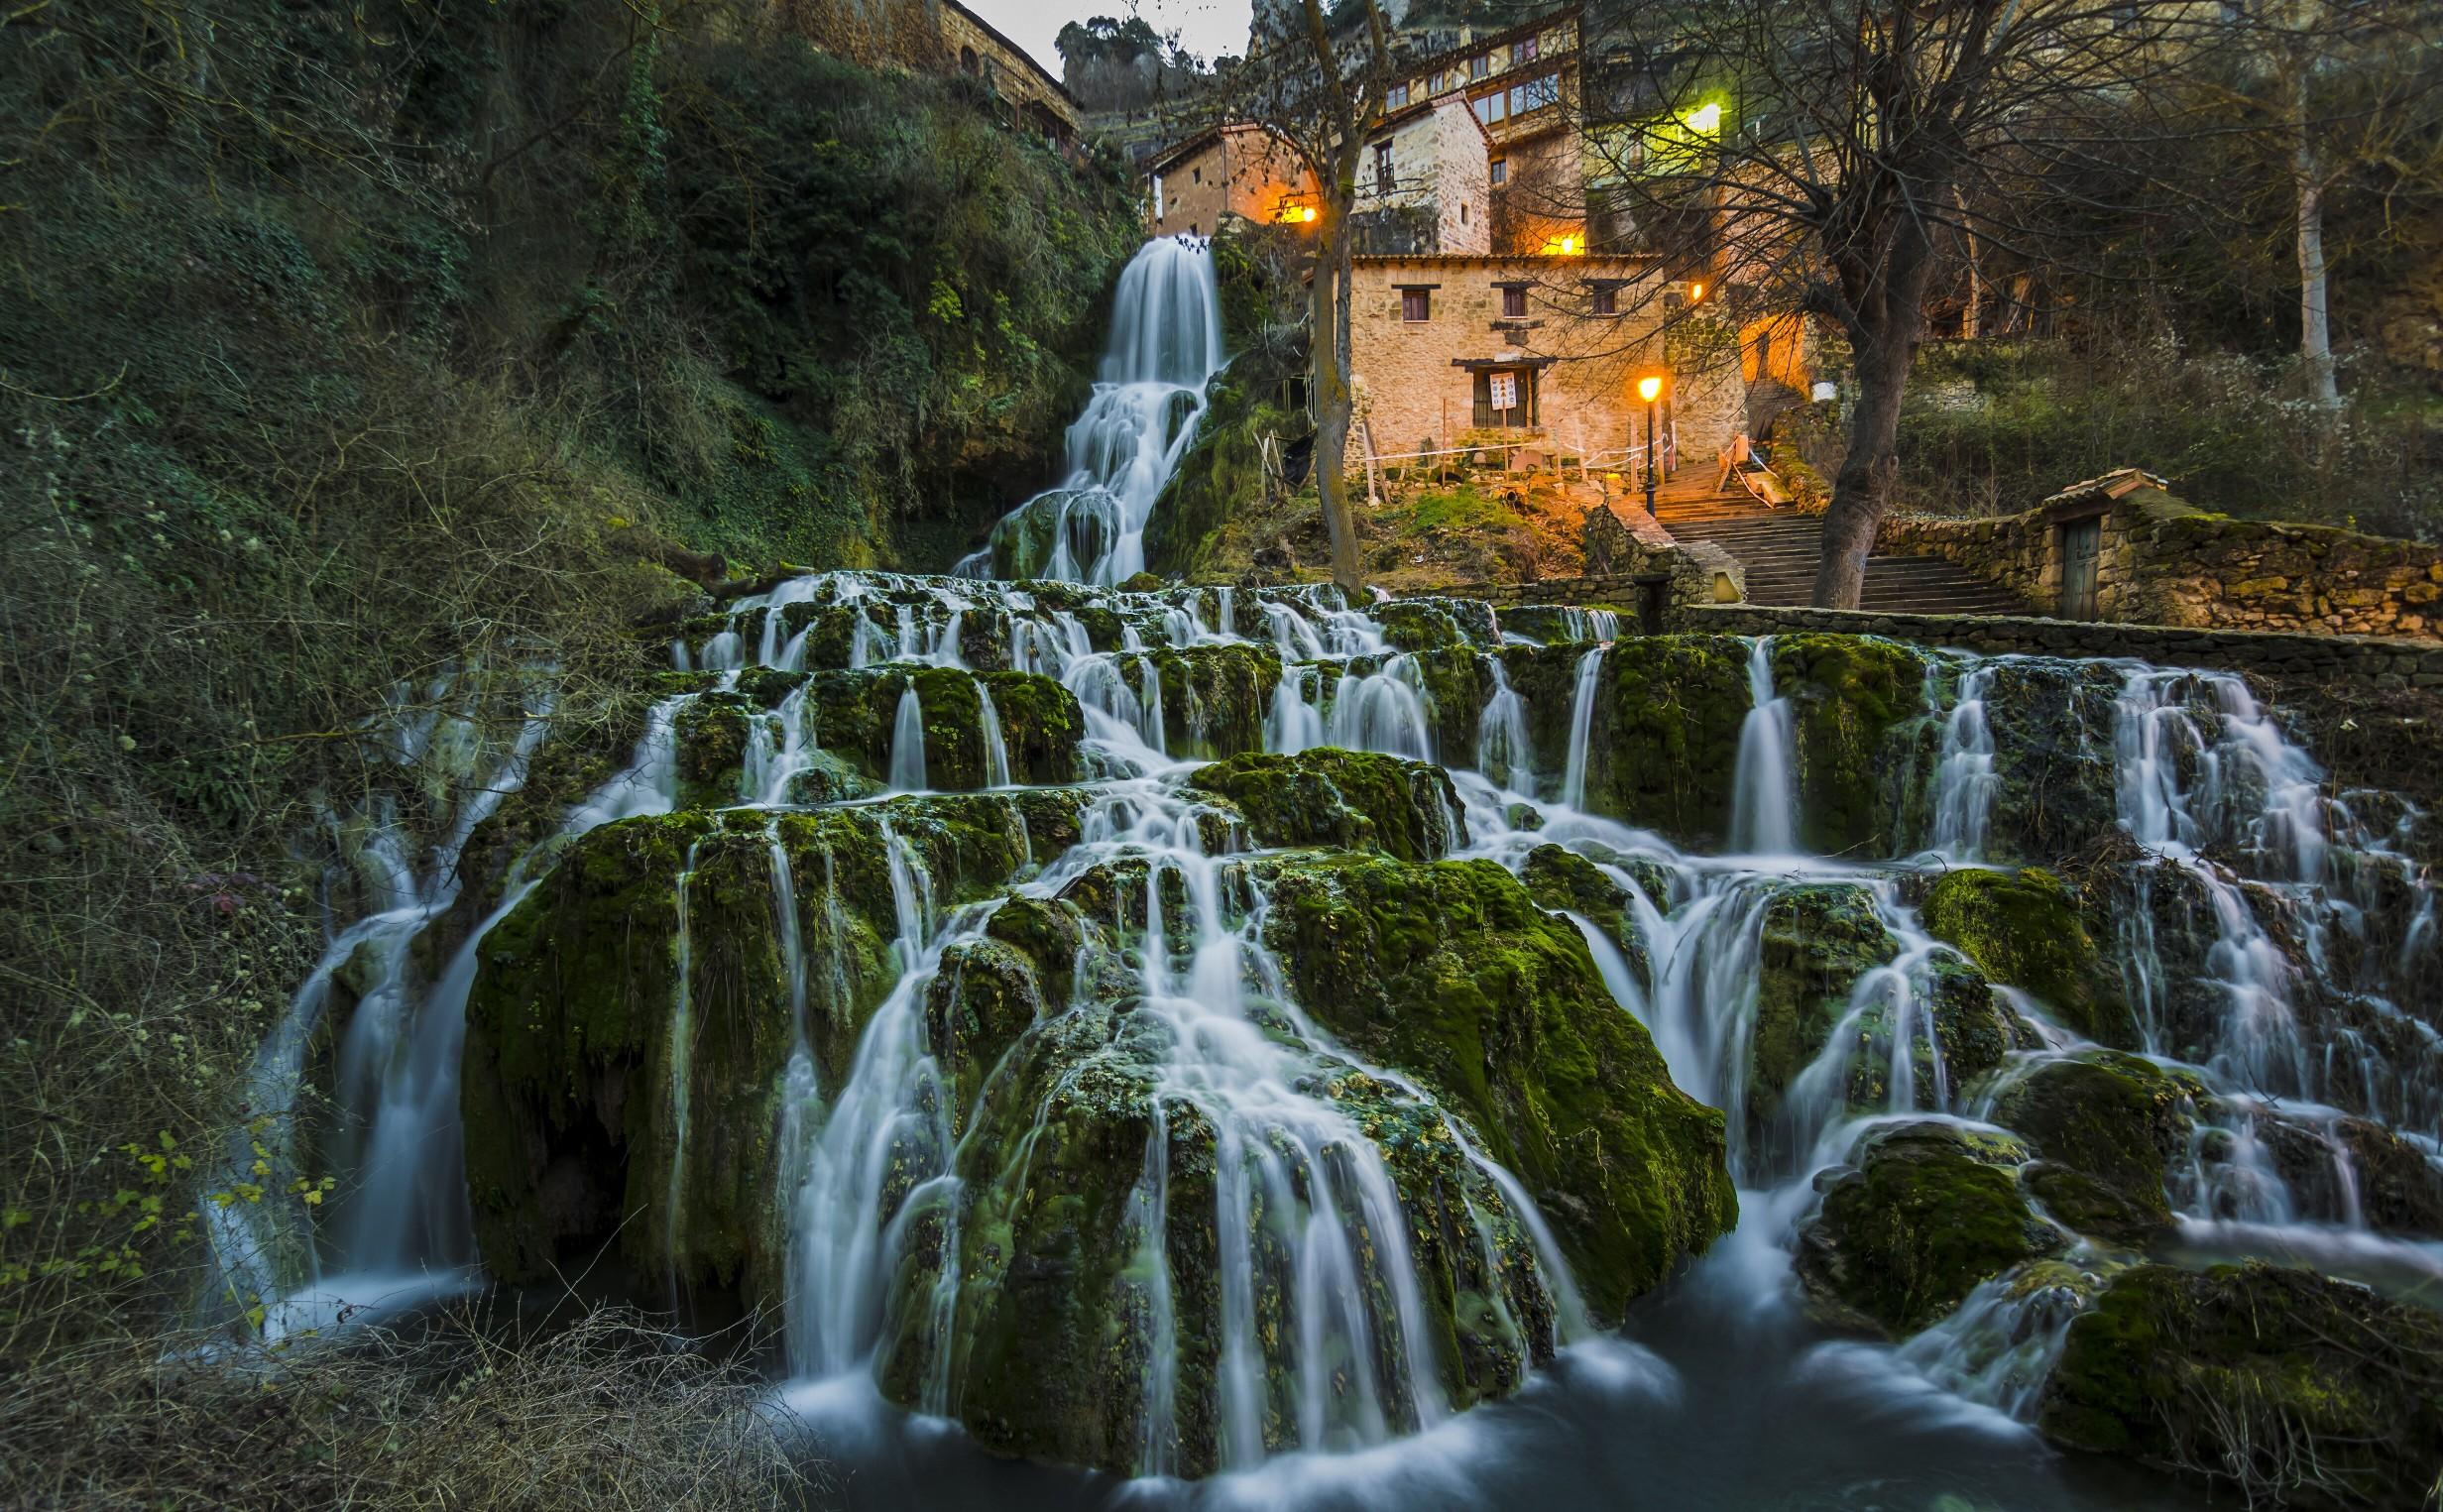 Wald Wasserfall Garten Wasser Natur Betrachtung Fluss Spanien Dschungel  Strom Regenwald Orbaneja Del Castillo Baum Herbst